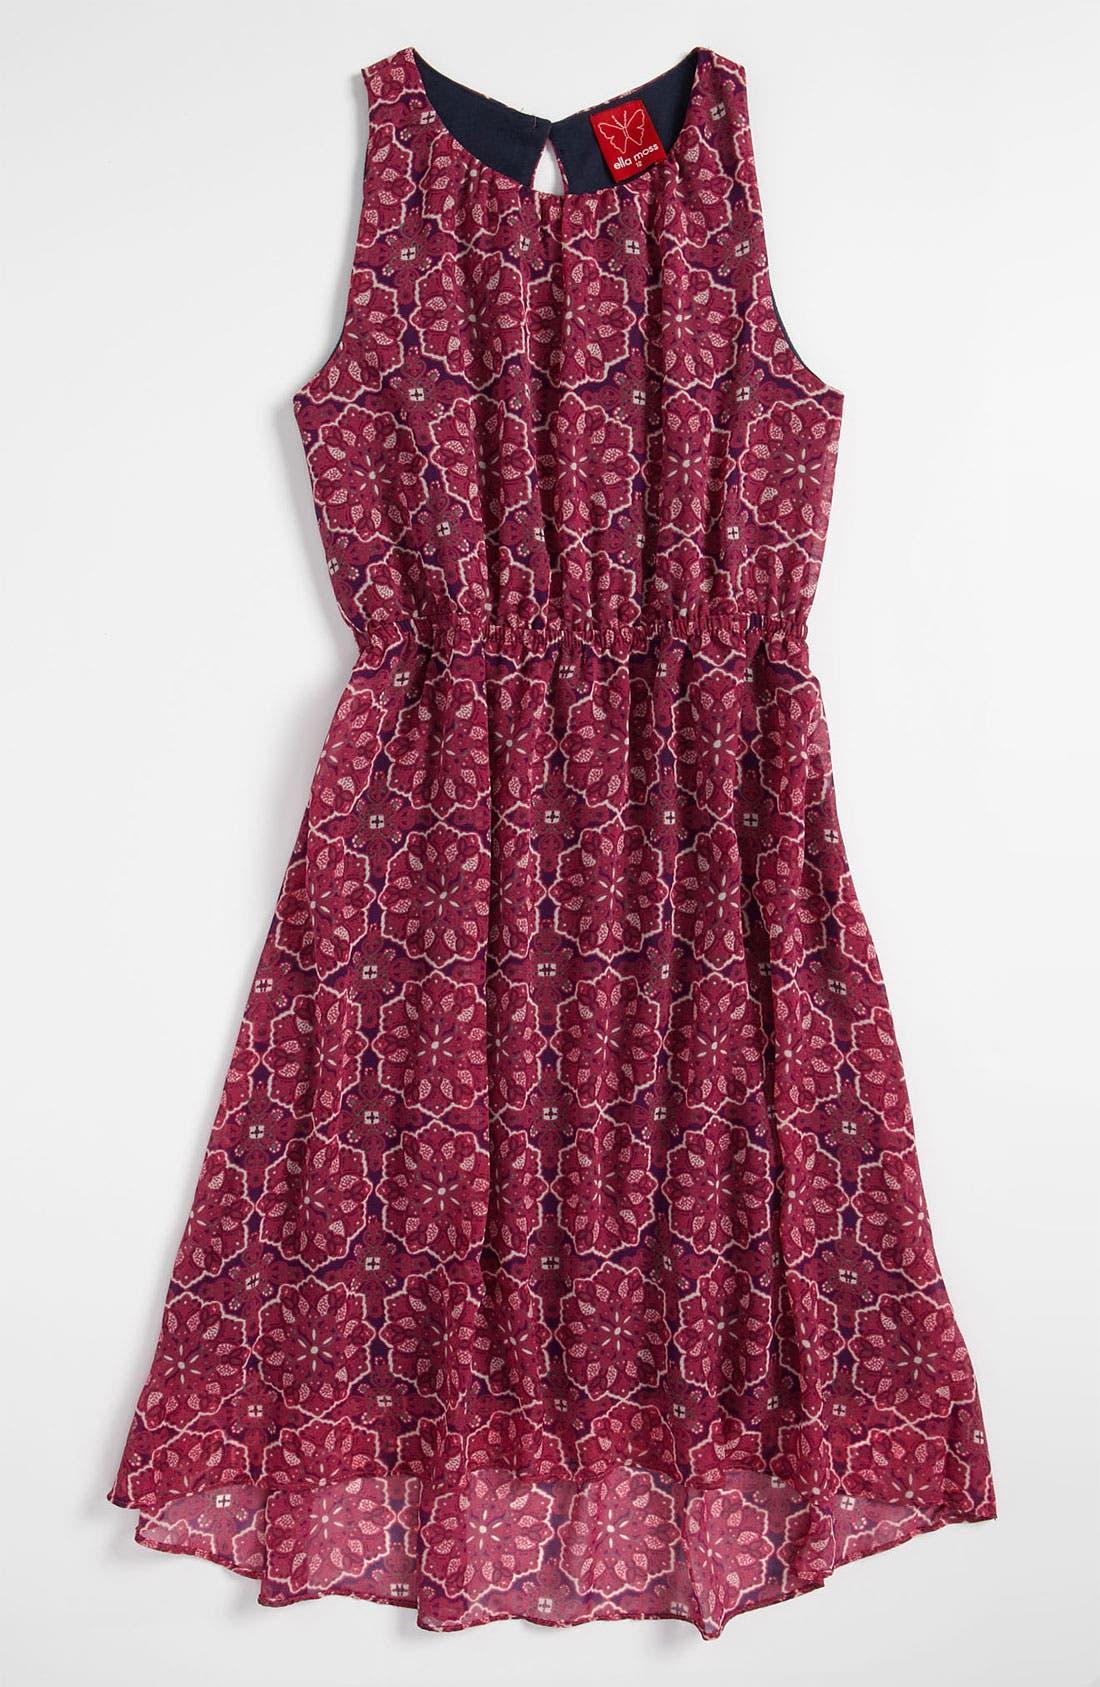 Alternate Image 1 Selected - Ella Moss 'Gueneviere' Tank Dress (Big Girls)